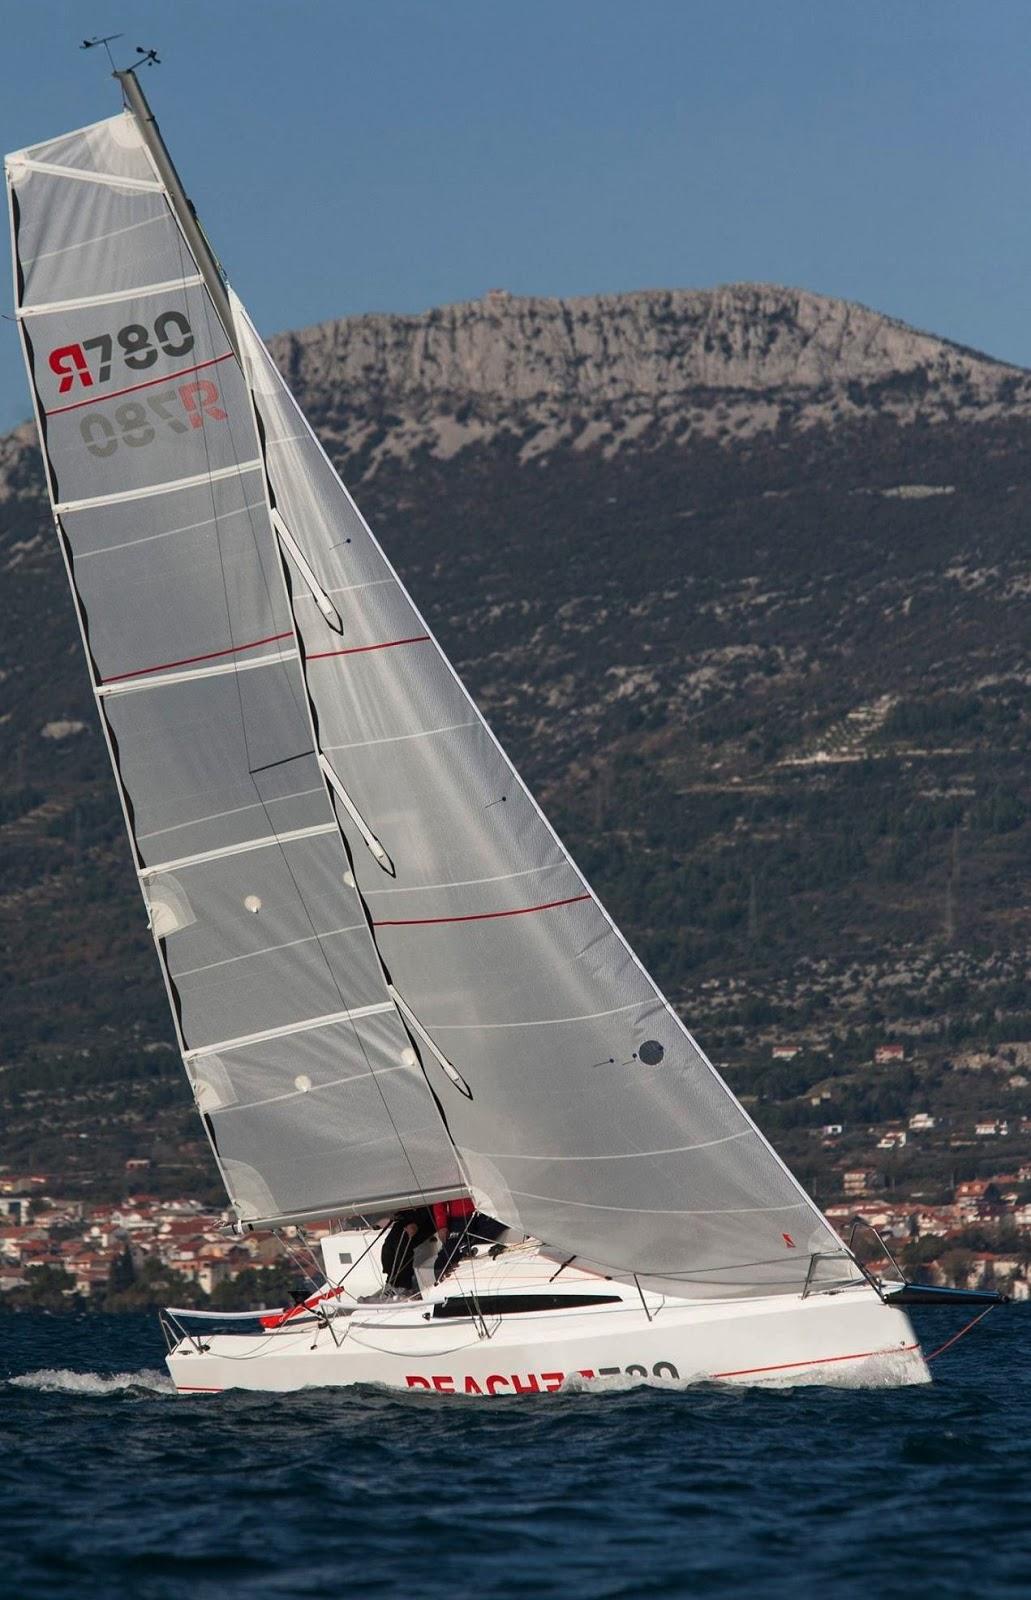 Interesting Sailboats: REACHER 780: INEXPENSIVE FAST RACING AND FUN